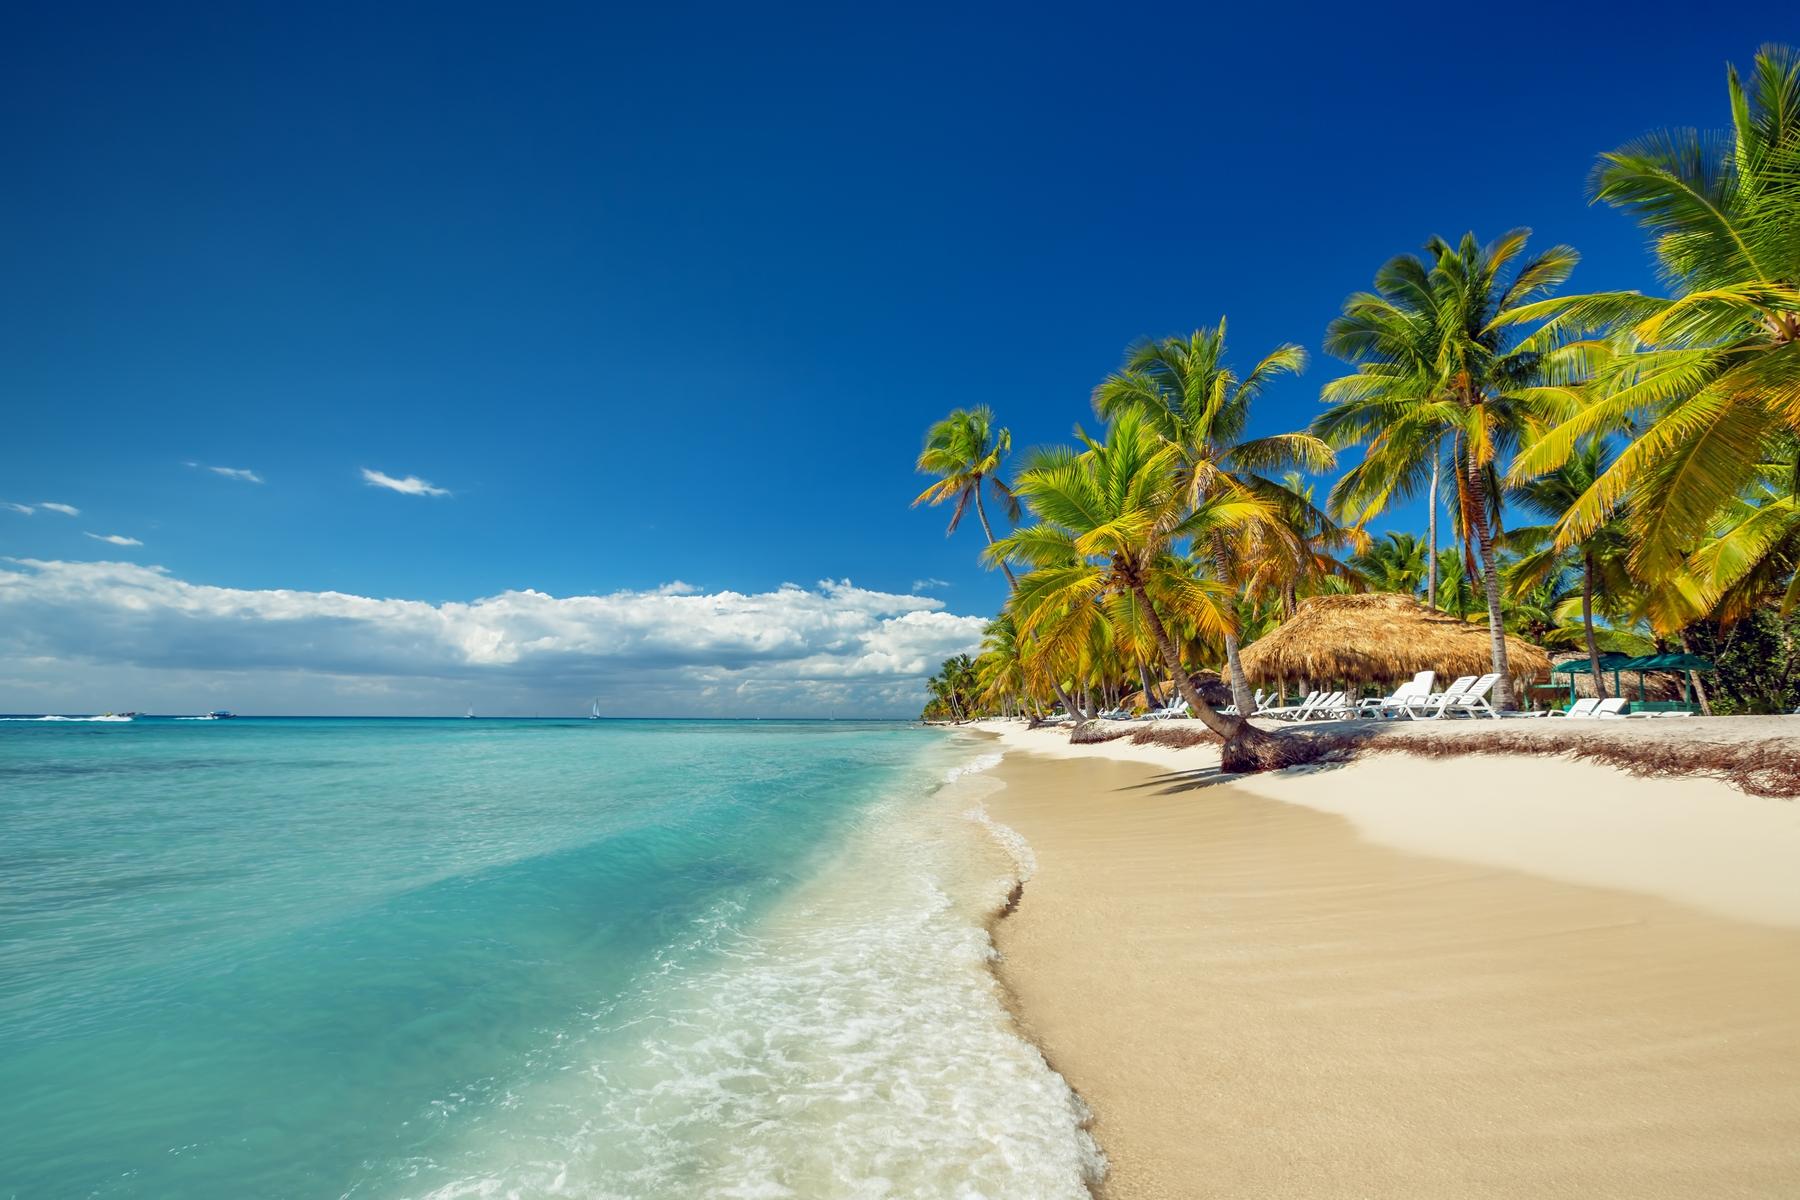 Praia paradisíaca na República Dominicana